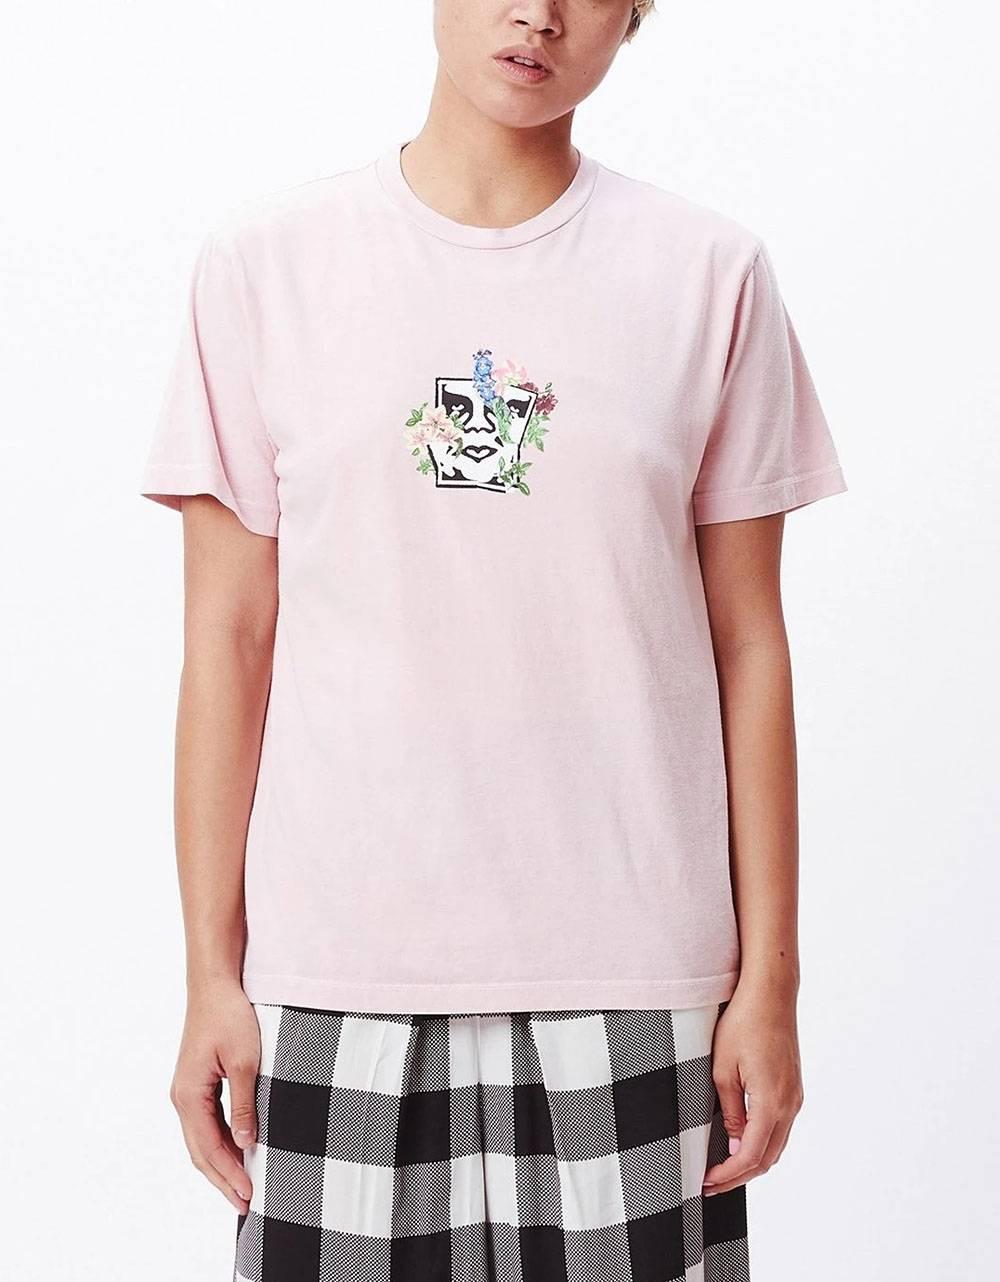 Obey Woman Flower burst choice box tee - peach obey T-shirt 37,70€